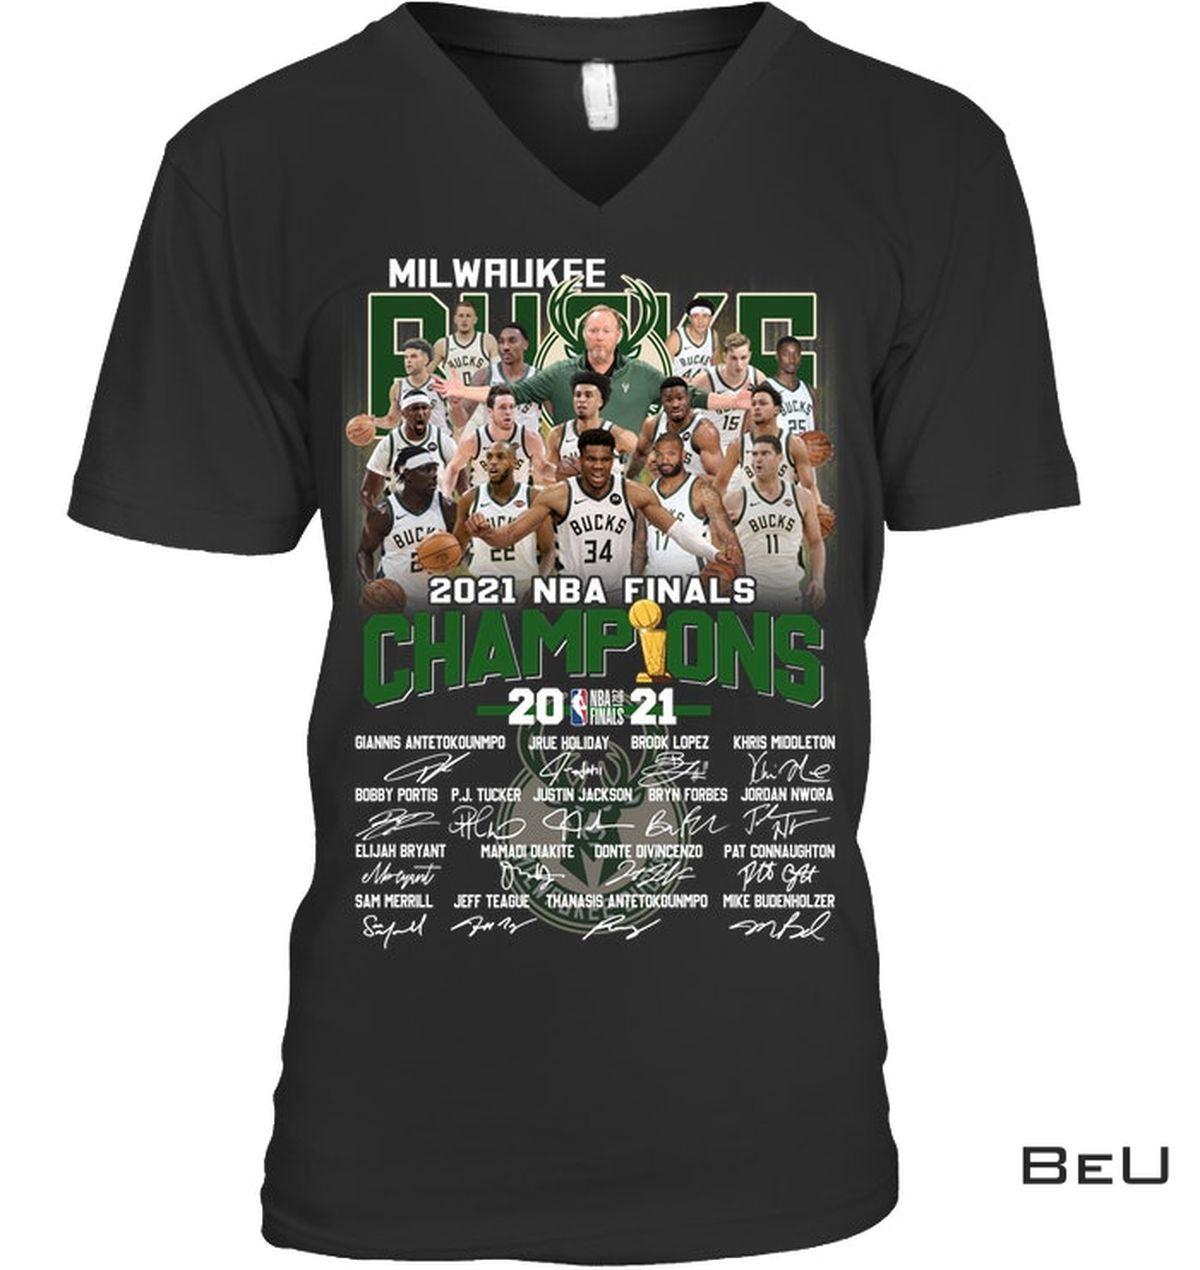 Real Milwaukee Brewers 2021 Nba Final Champion Shirt